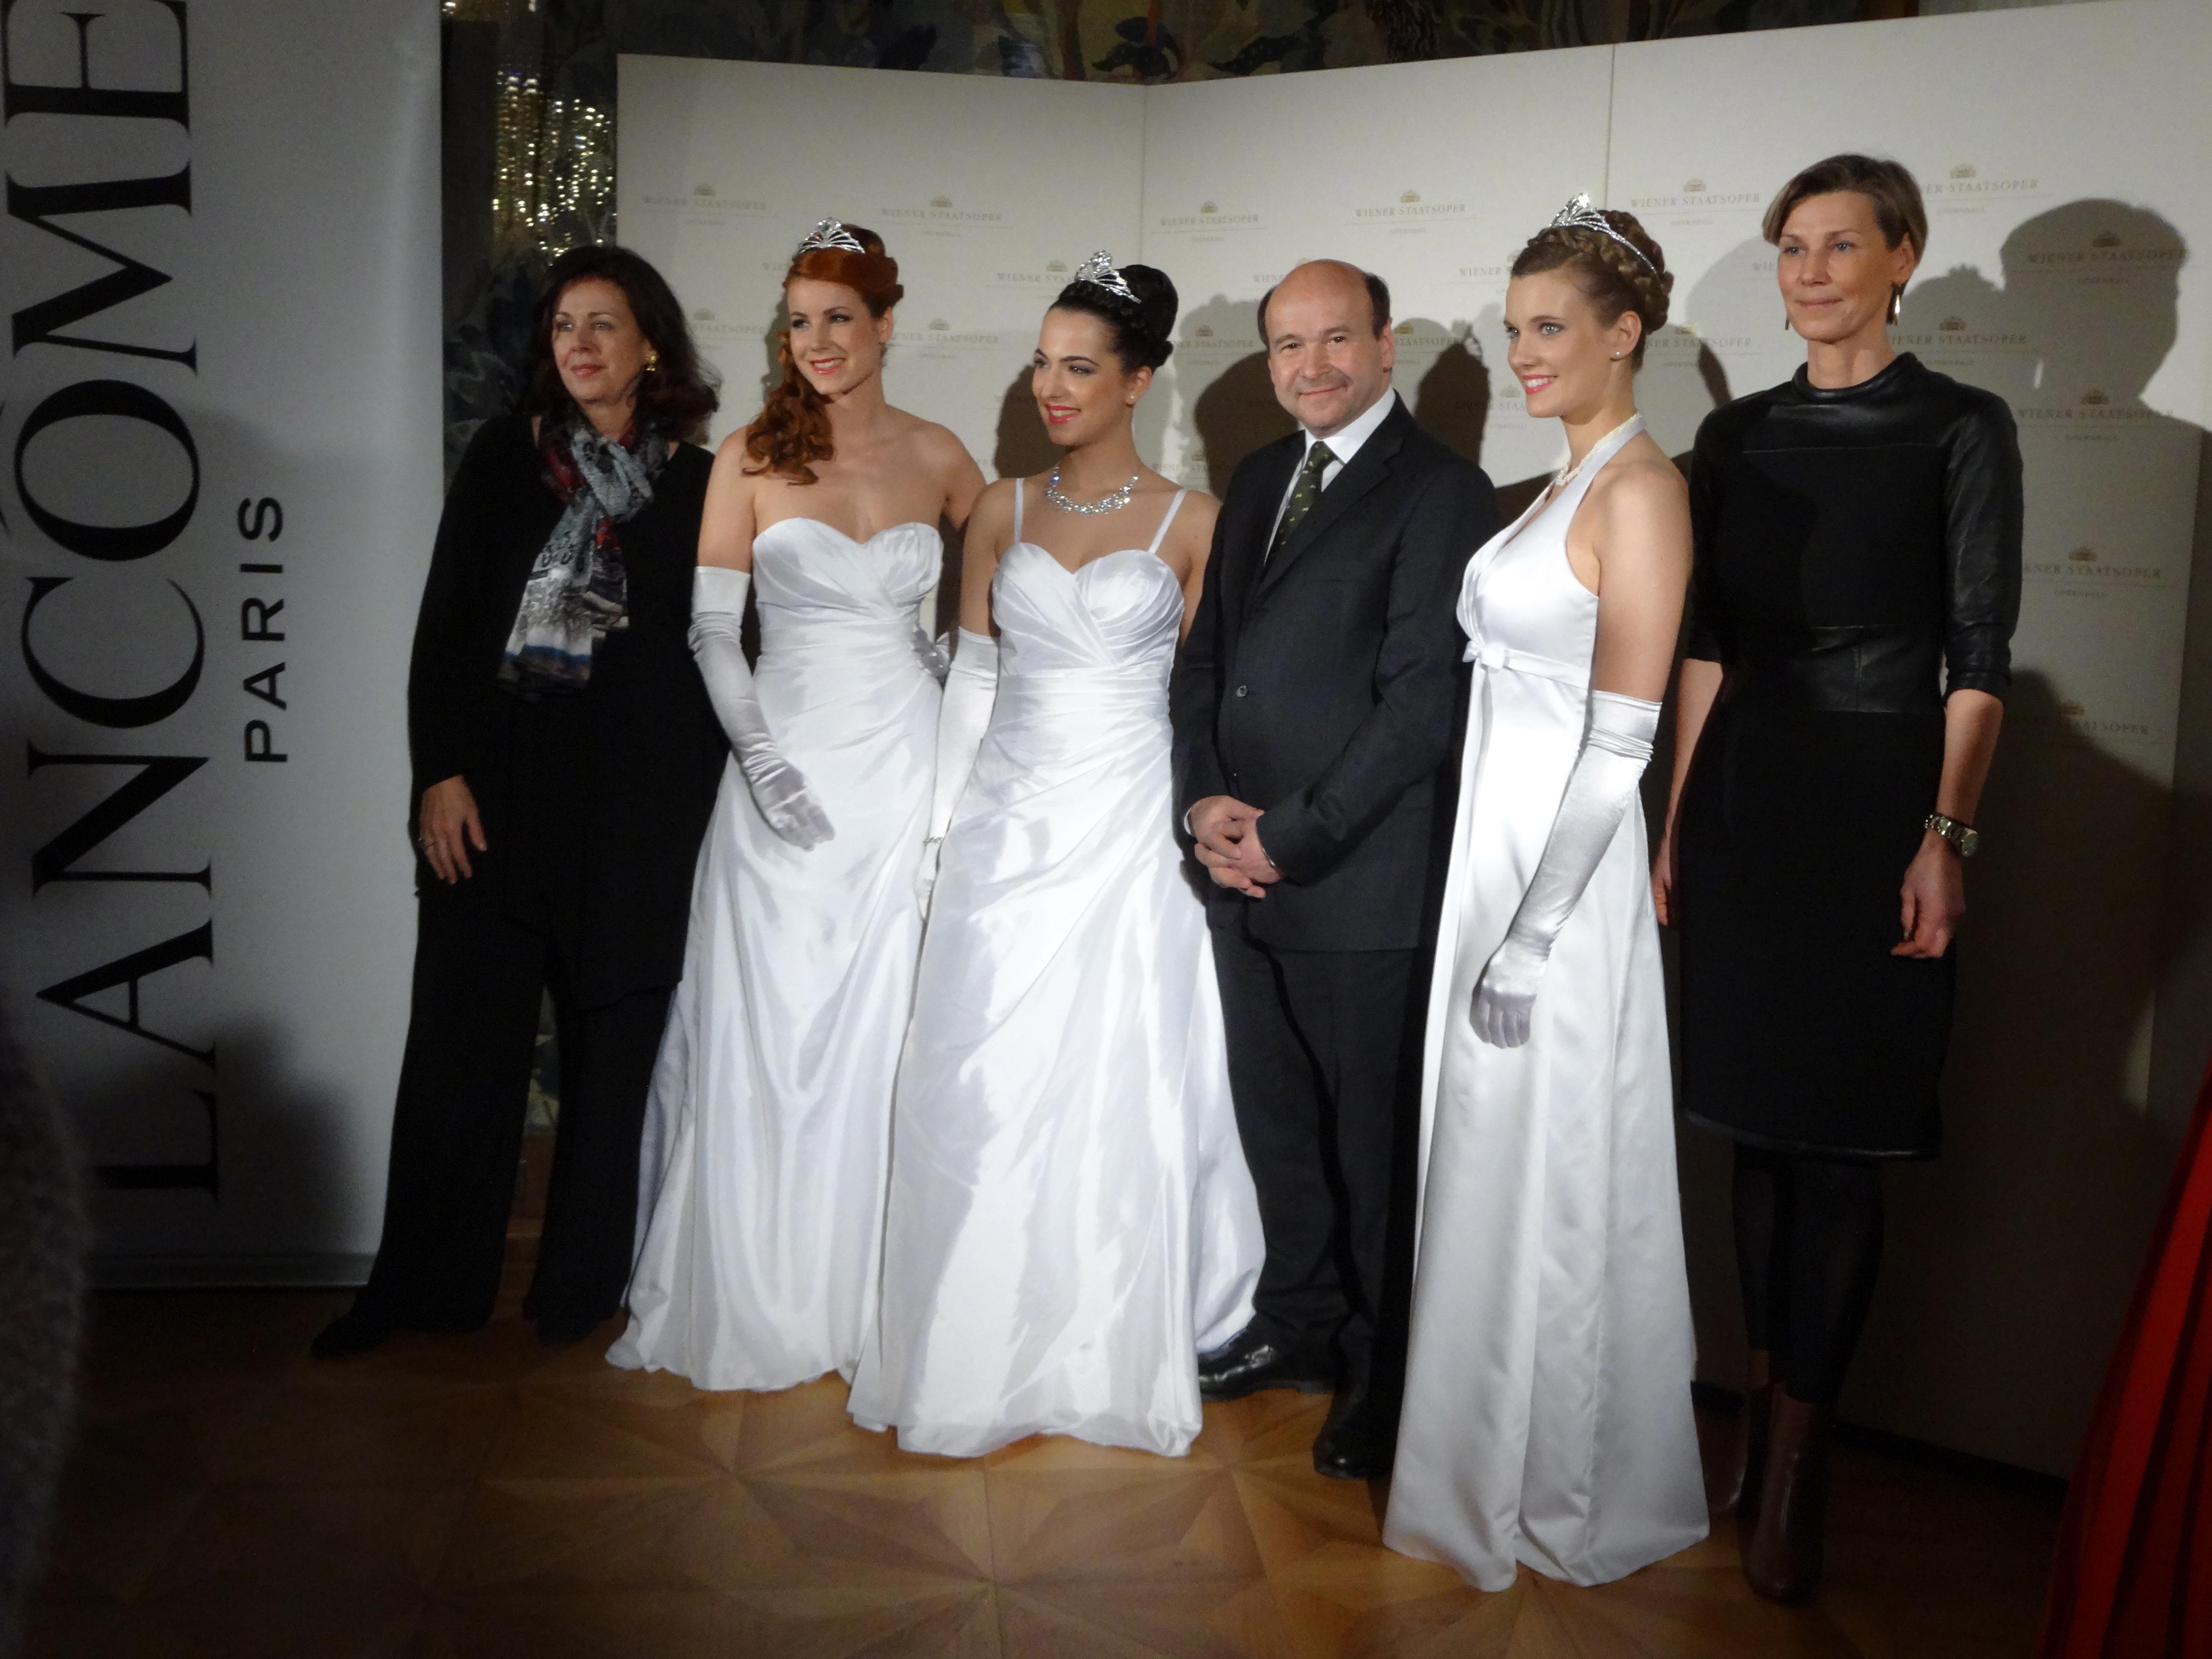 Eva Dintsis, Debutantes, Dominique Meyer, Debutante, Desirée Treichl-Stürgkh